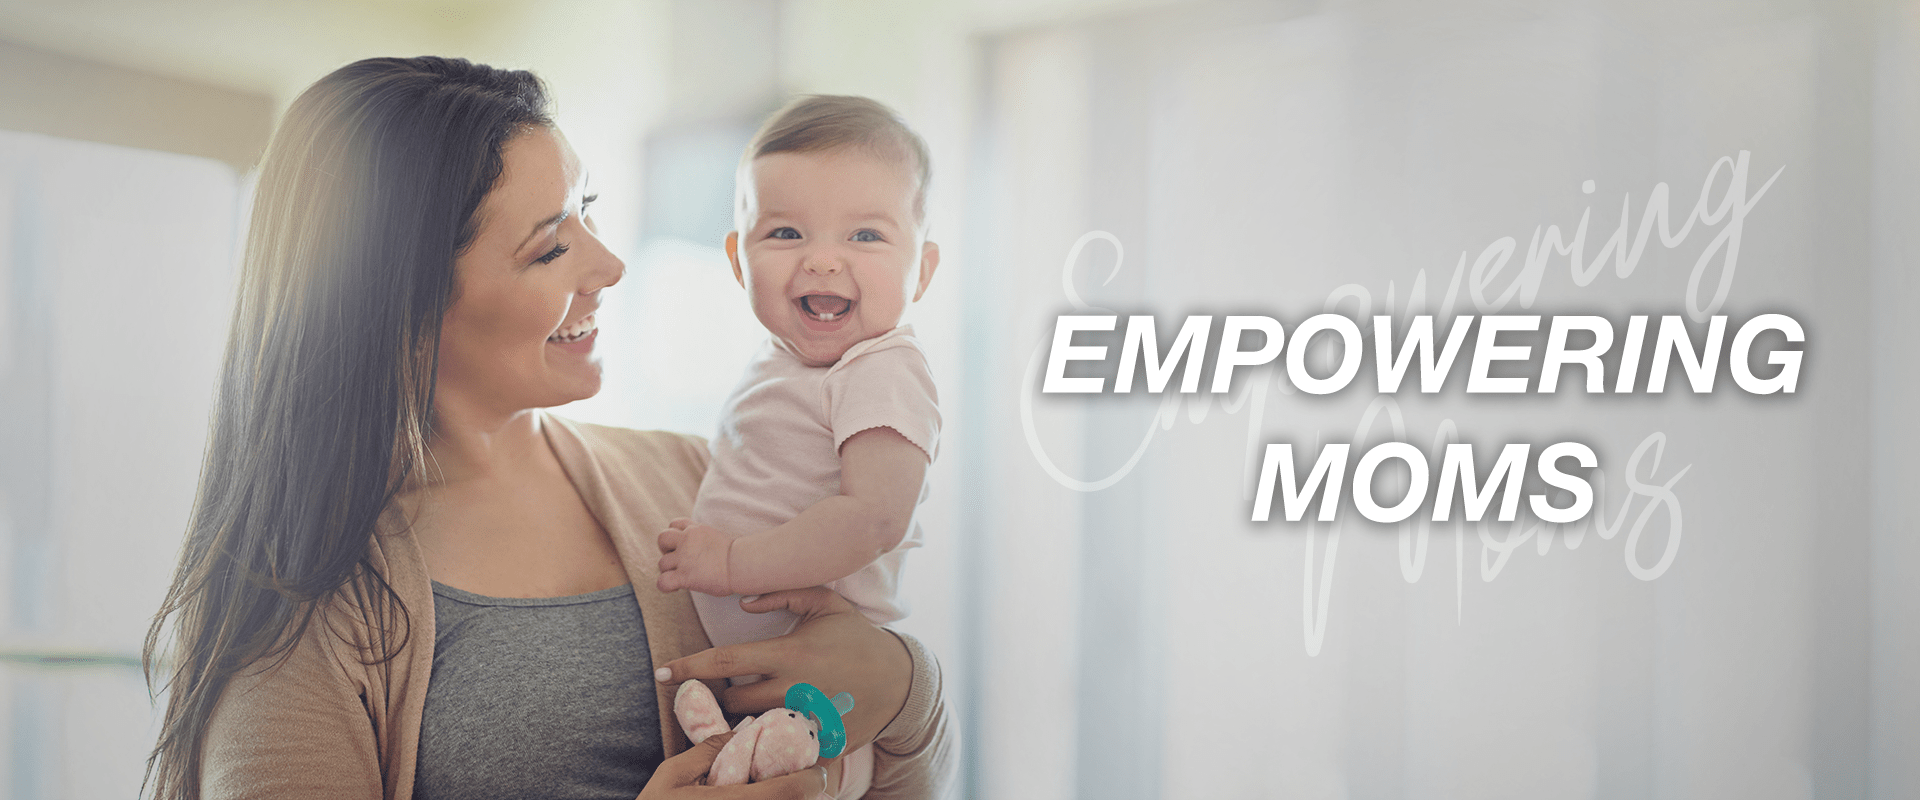 empowering-moms